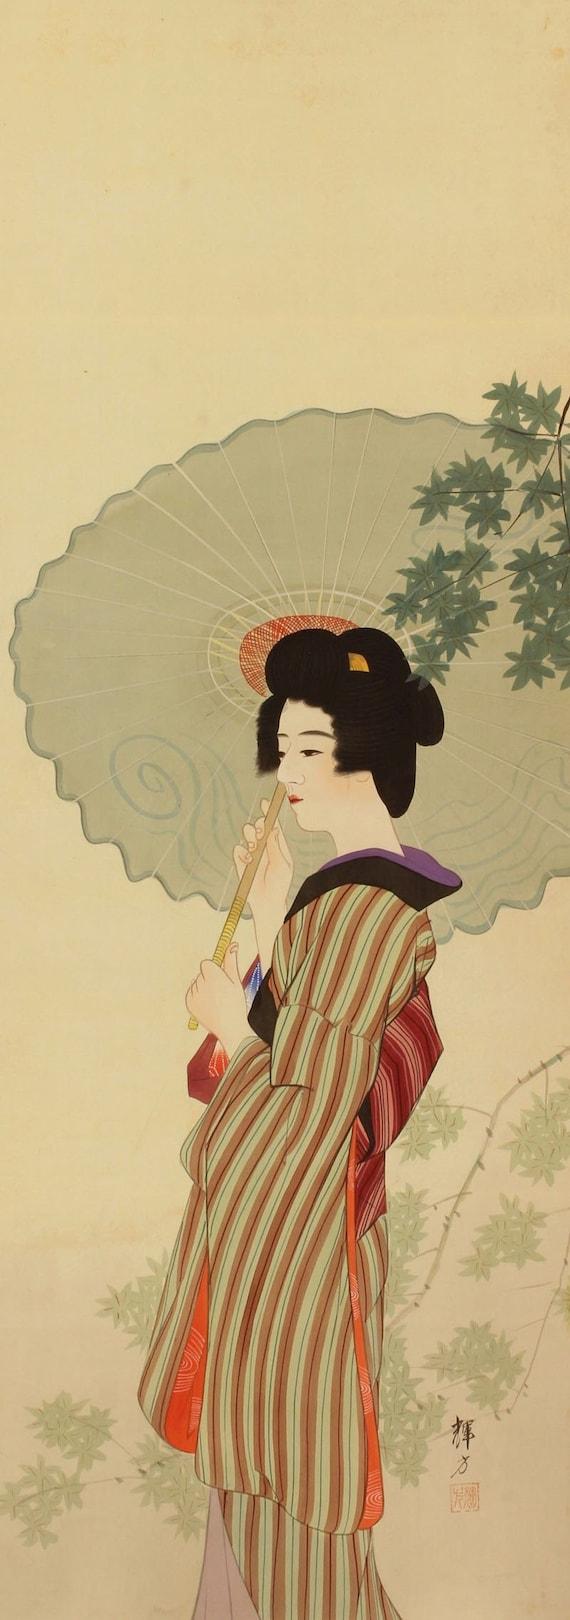 Japanese Scroll Painting Kakejiku Taisho Art Wall Décor | Etsy